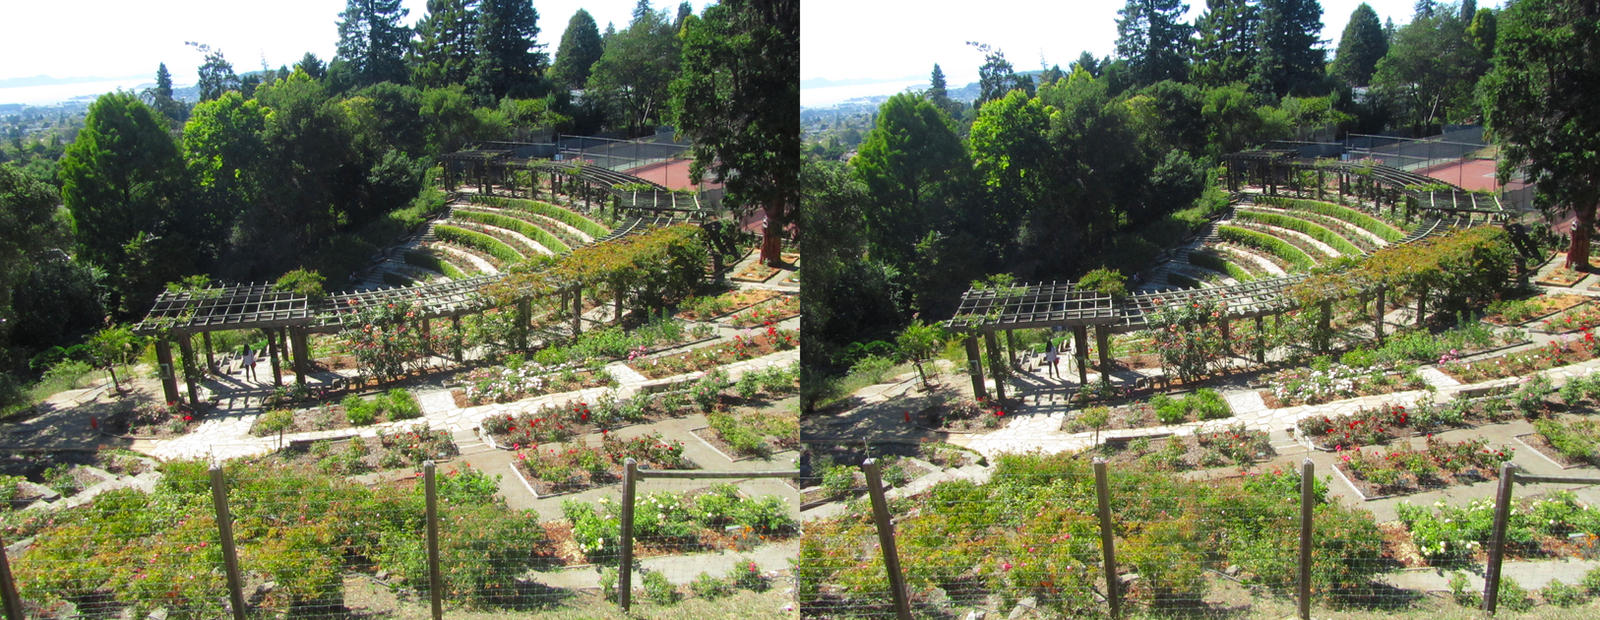 Stereograph - Rose Garden by alanbecker